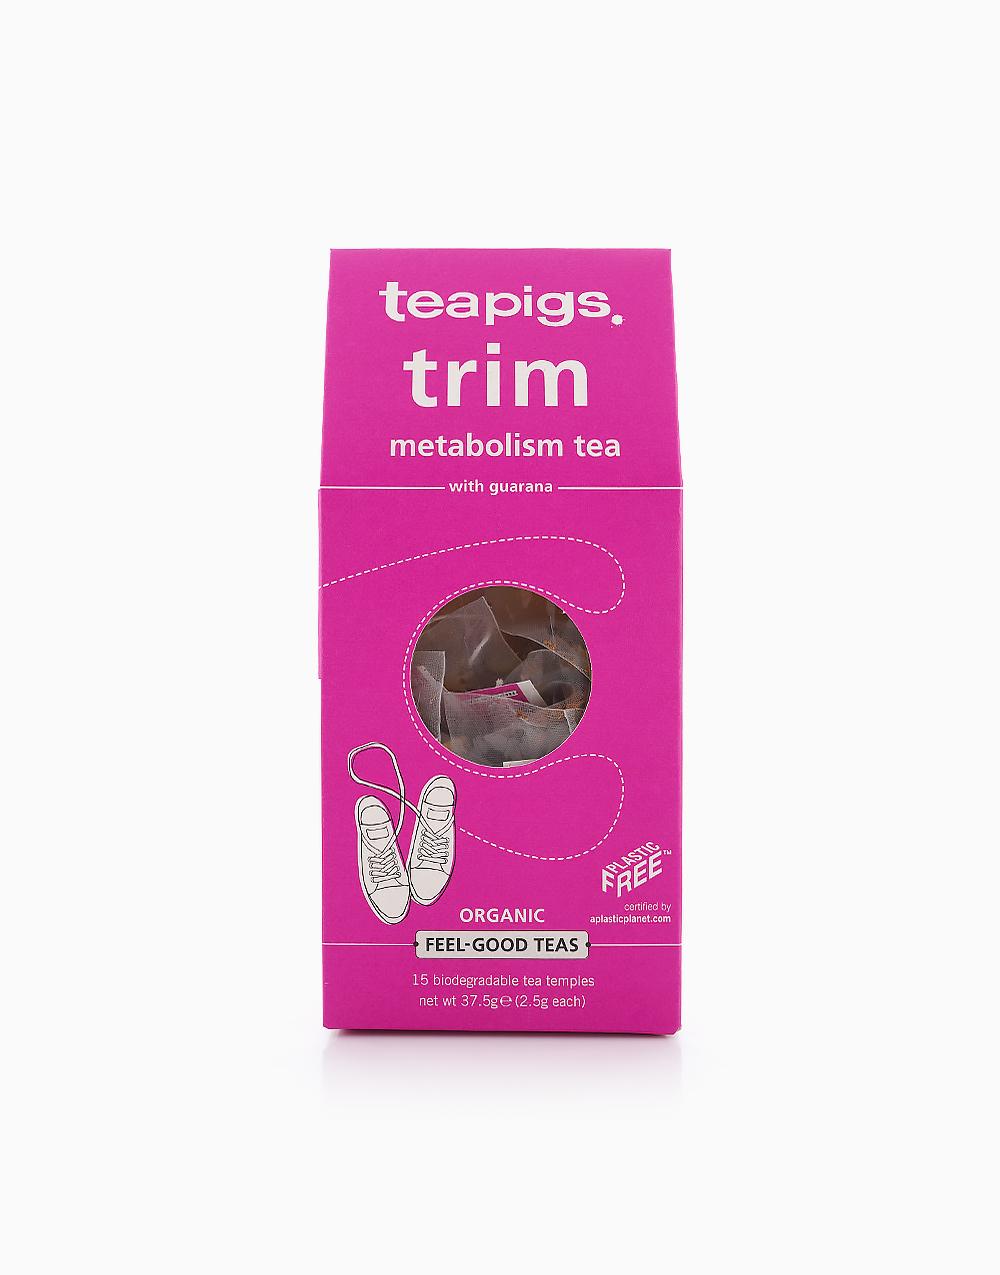 Trim Metabolism Tea by Teapigs